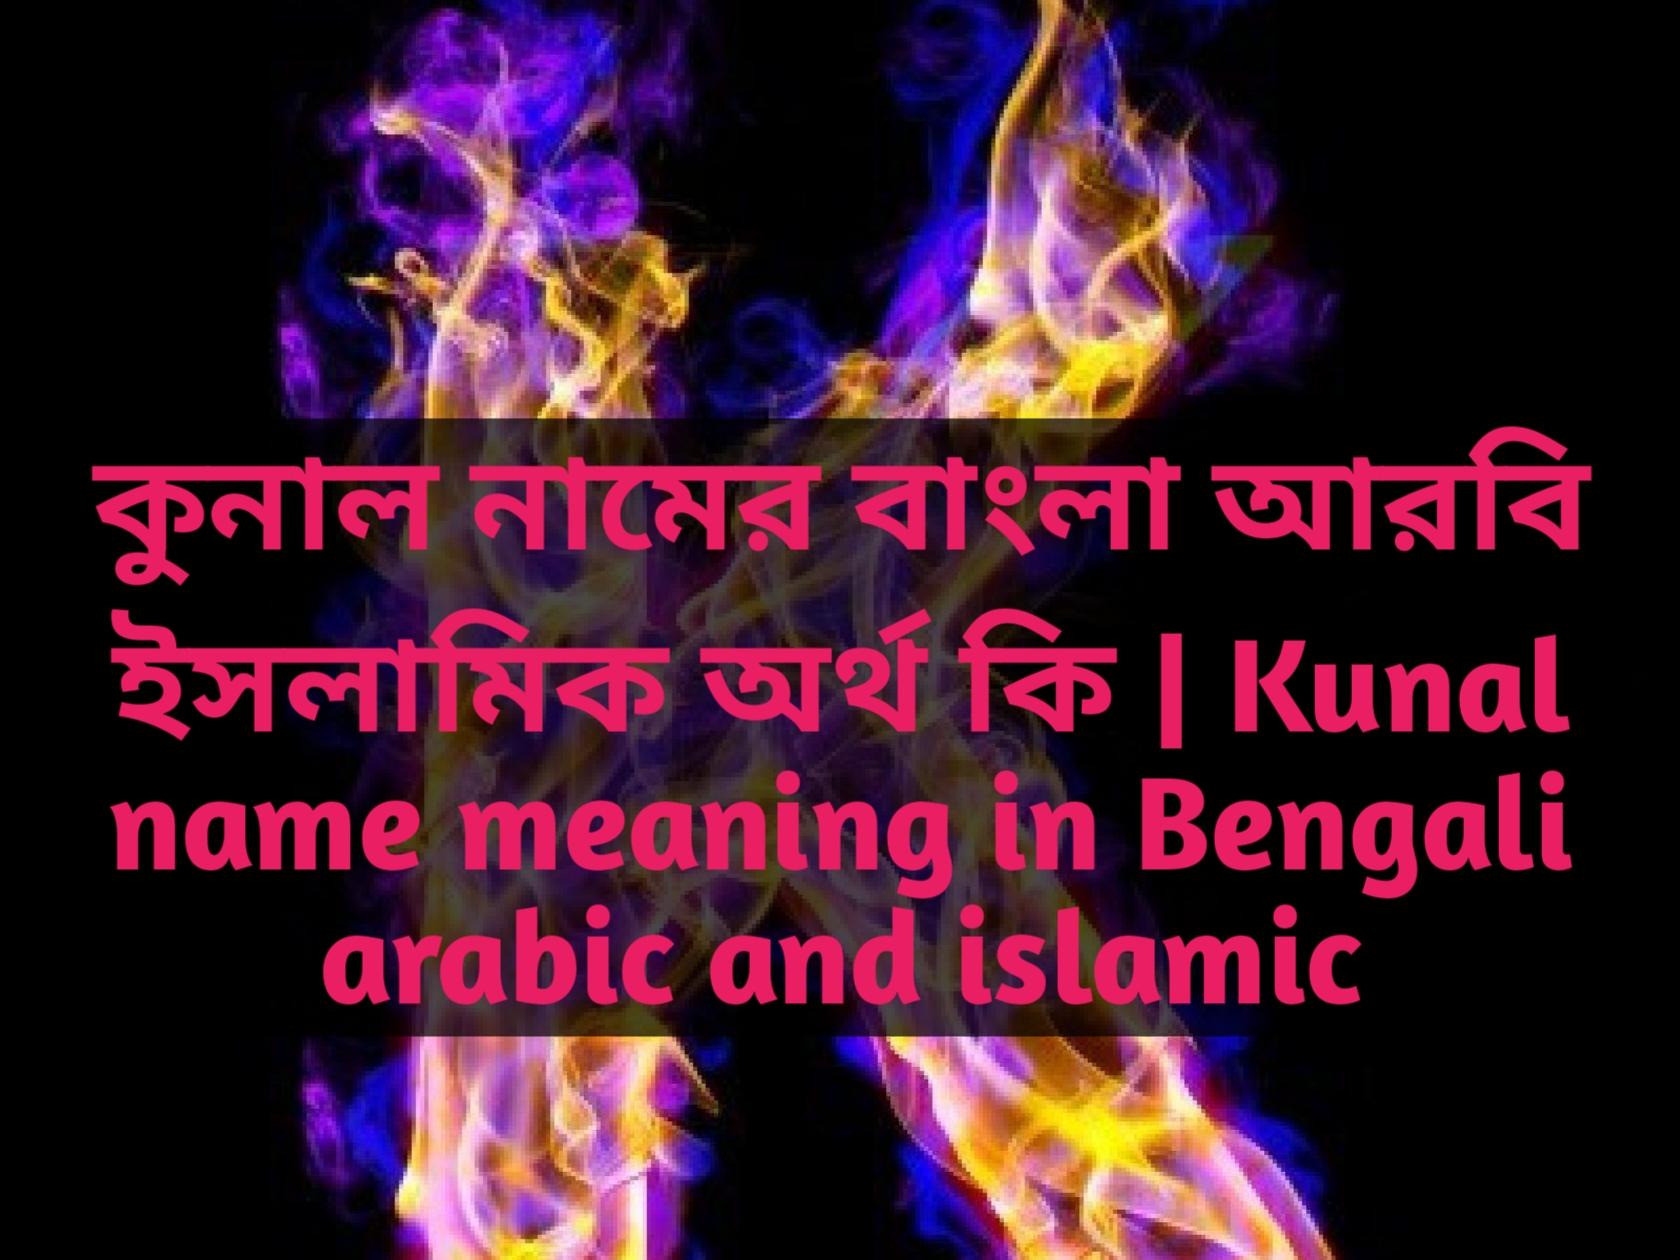 Kunal name meaning in Bengali, কুনাল নামের অর্থ কি, কুনাল নামের বাংলা অর্থ কি, কুনাল নামের ইসলামিক অর্থ কি,